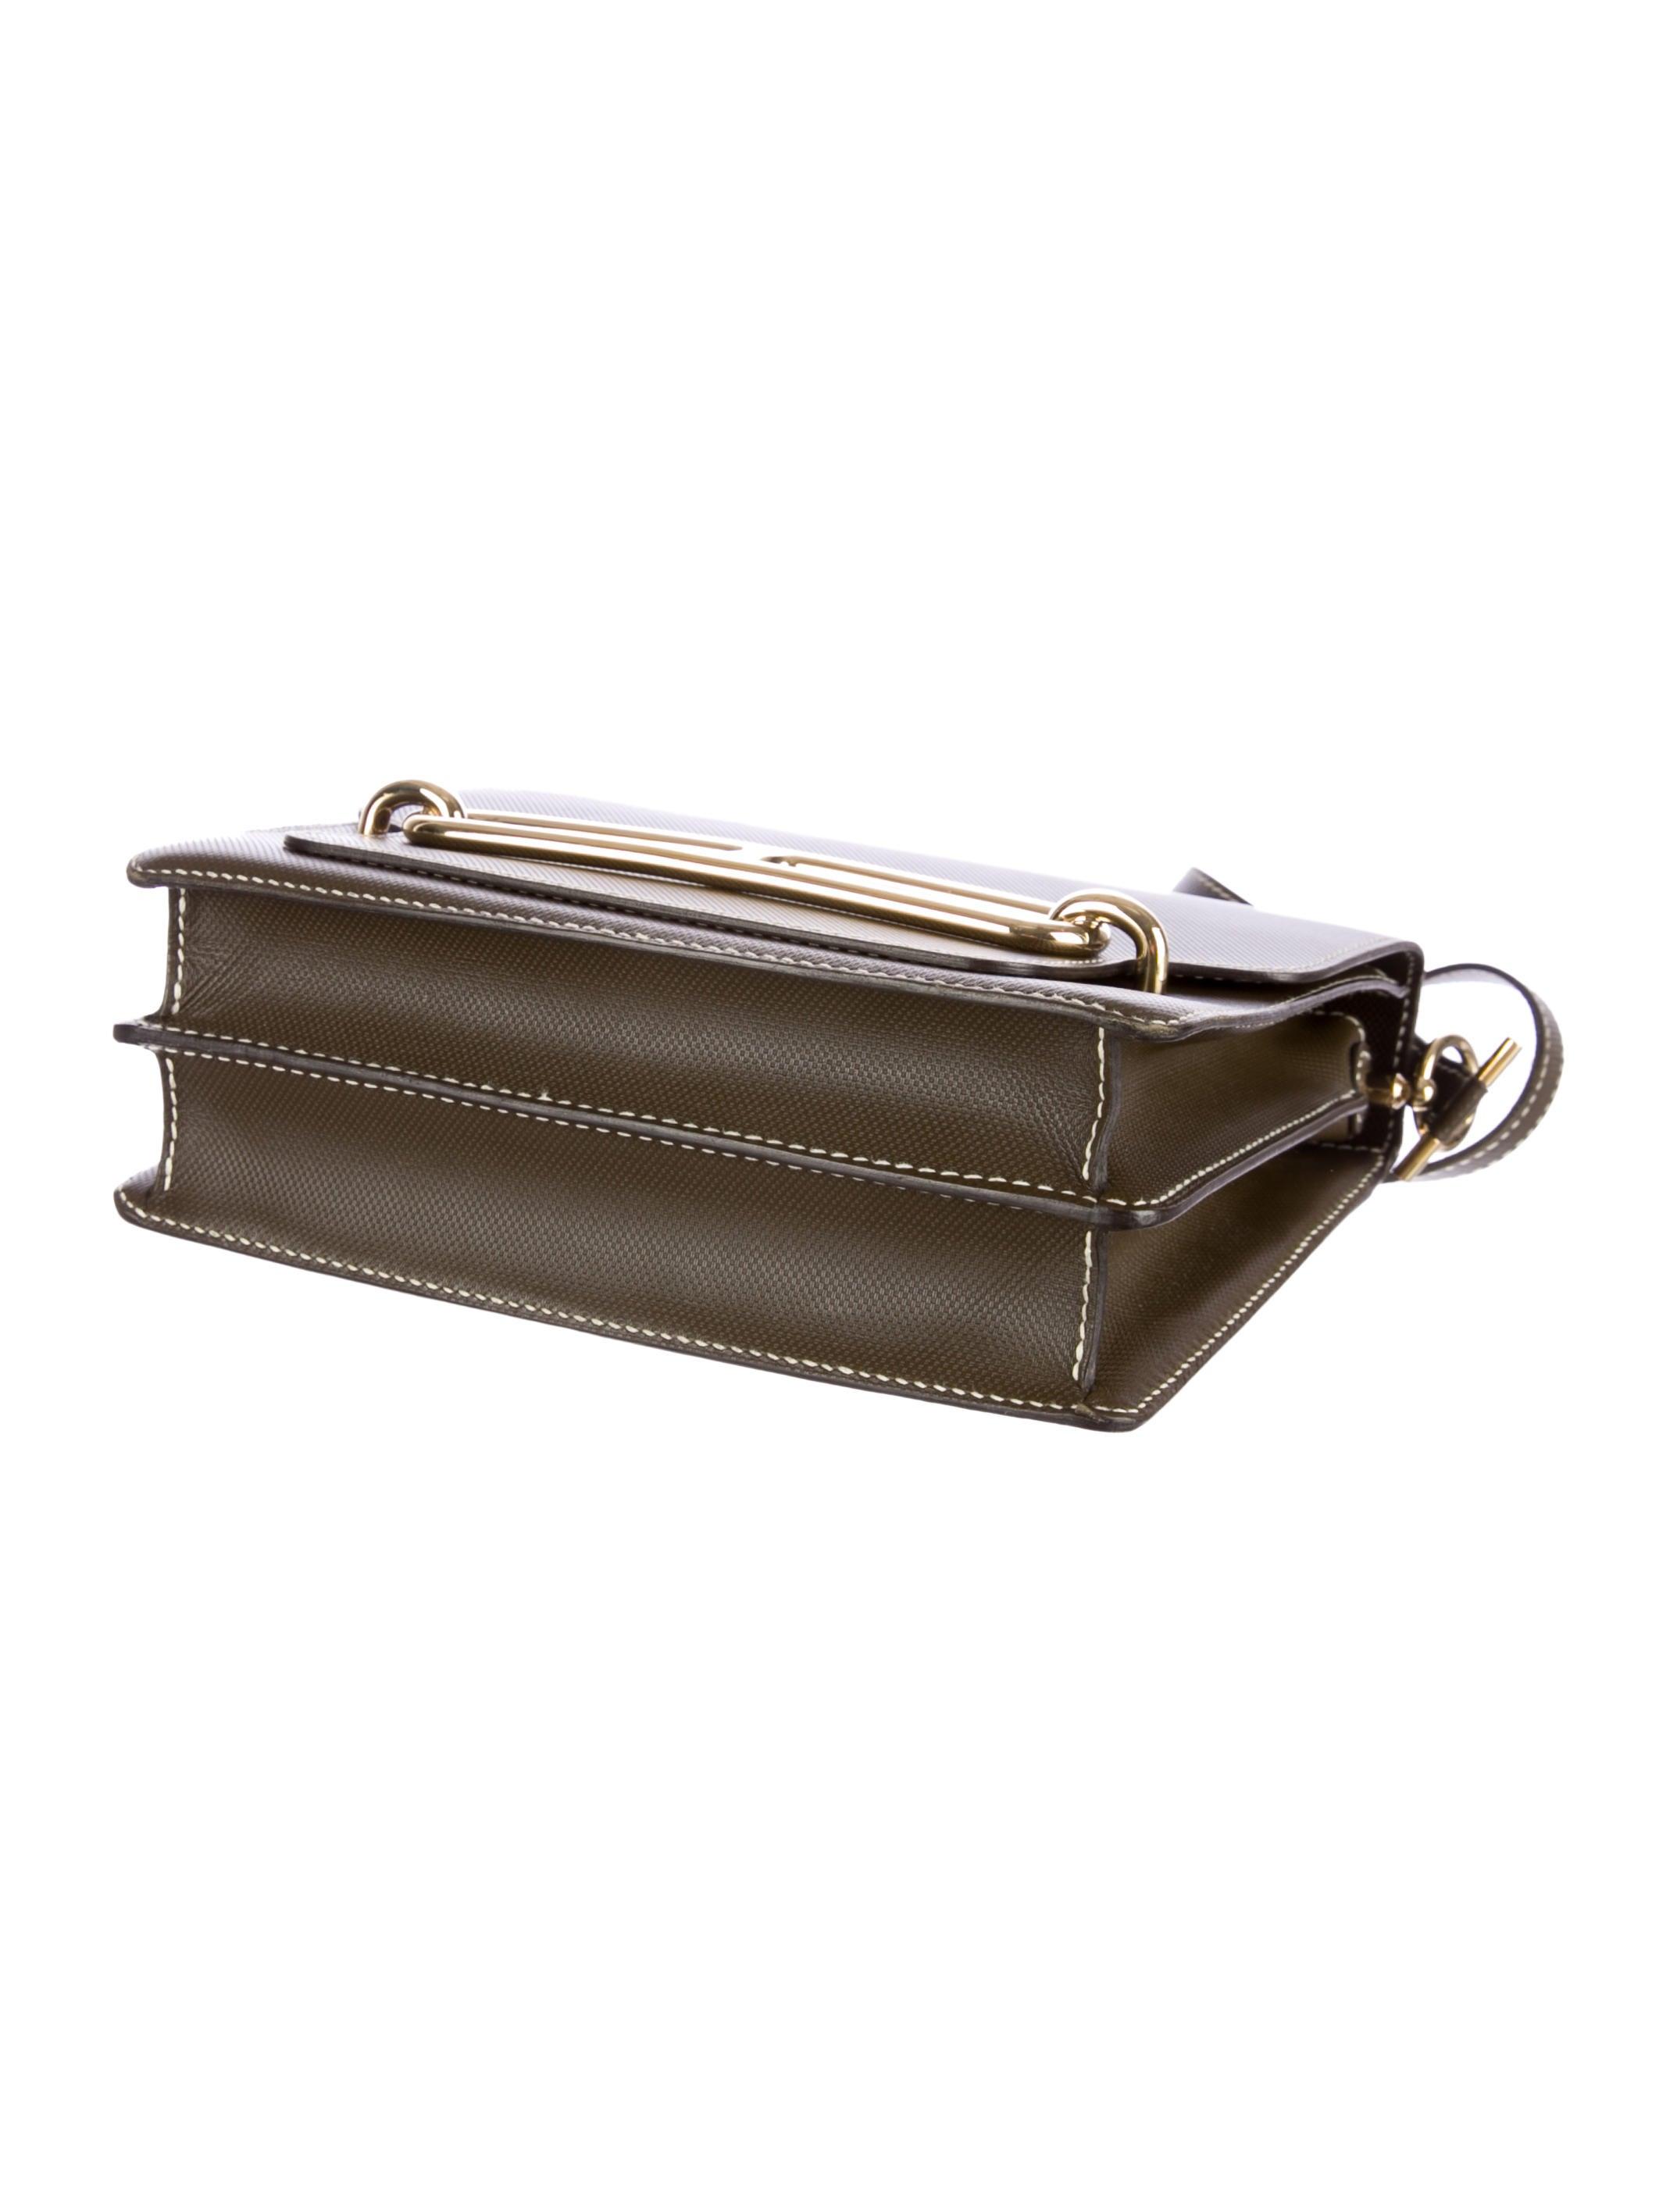 Herm��s Sac Roulis - Handbags - HER43168   The RealReal